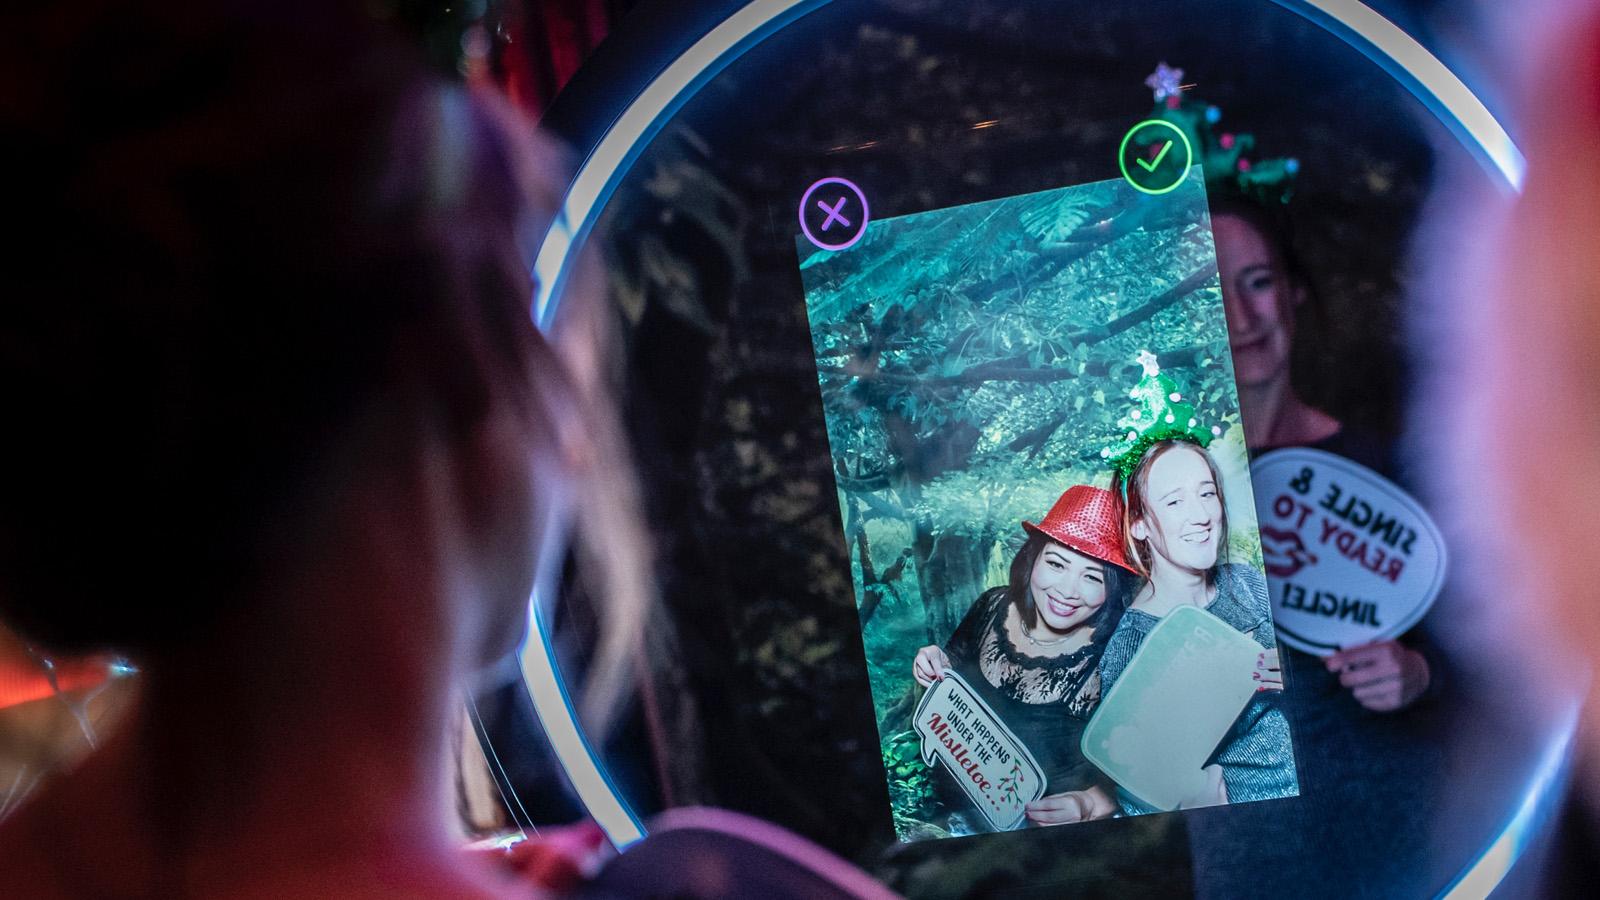 beauty-magic-mirror-photo-booth-rental-12x12-0m